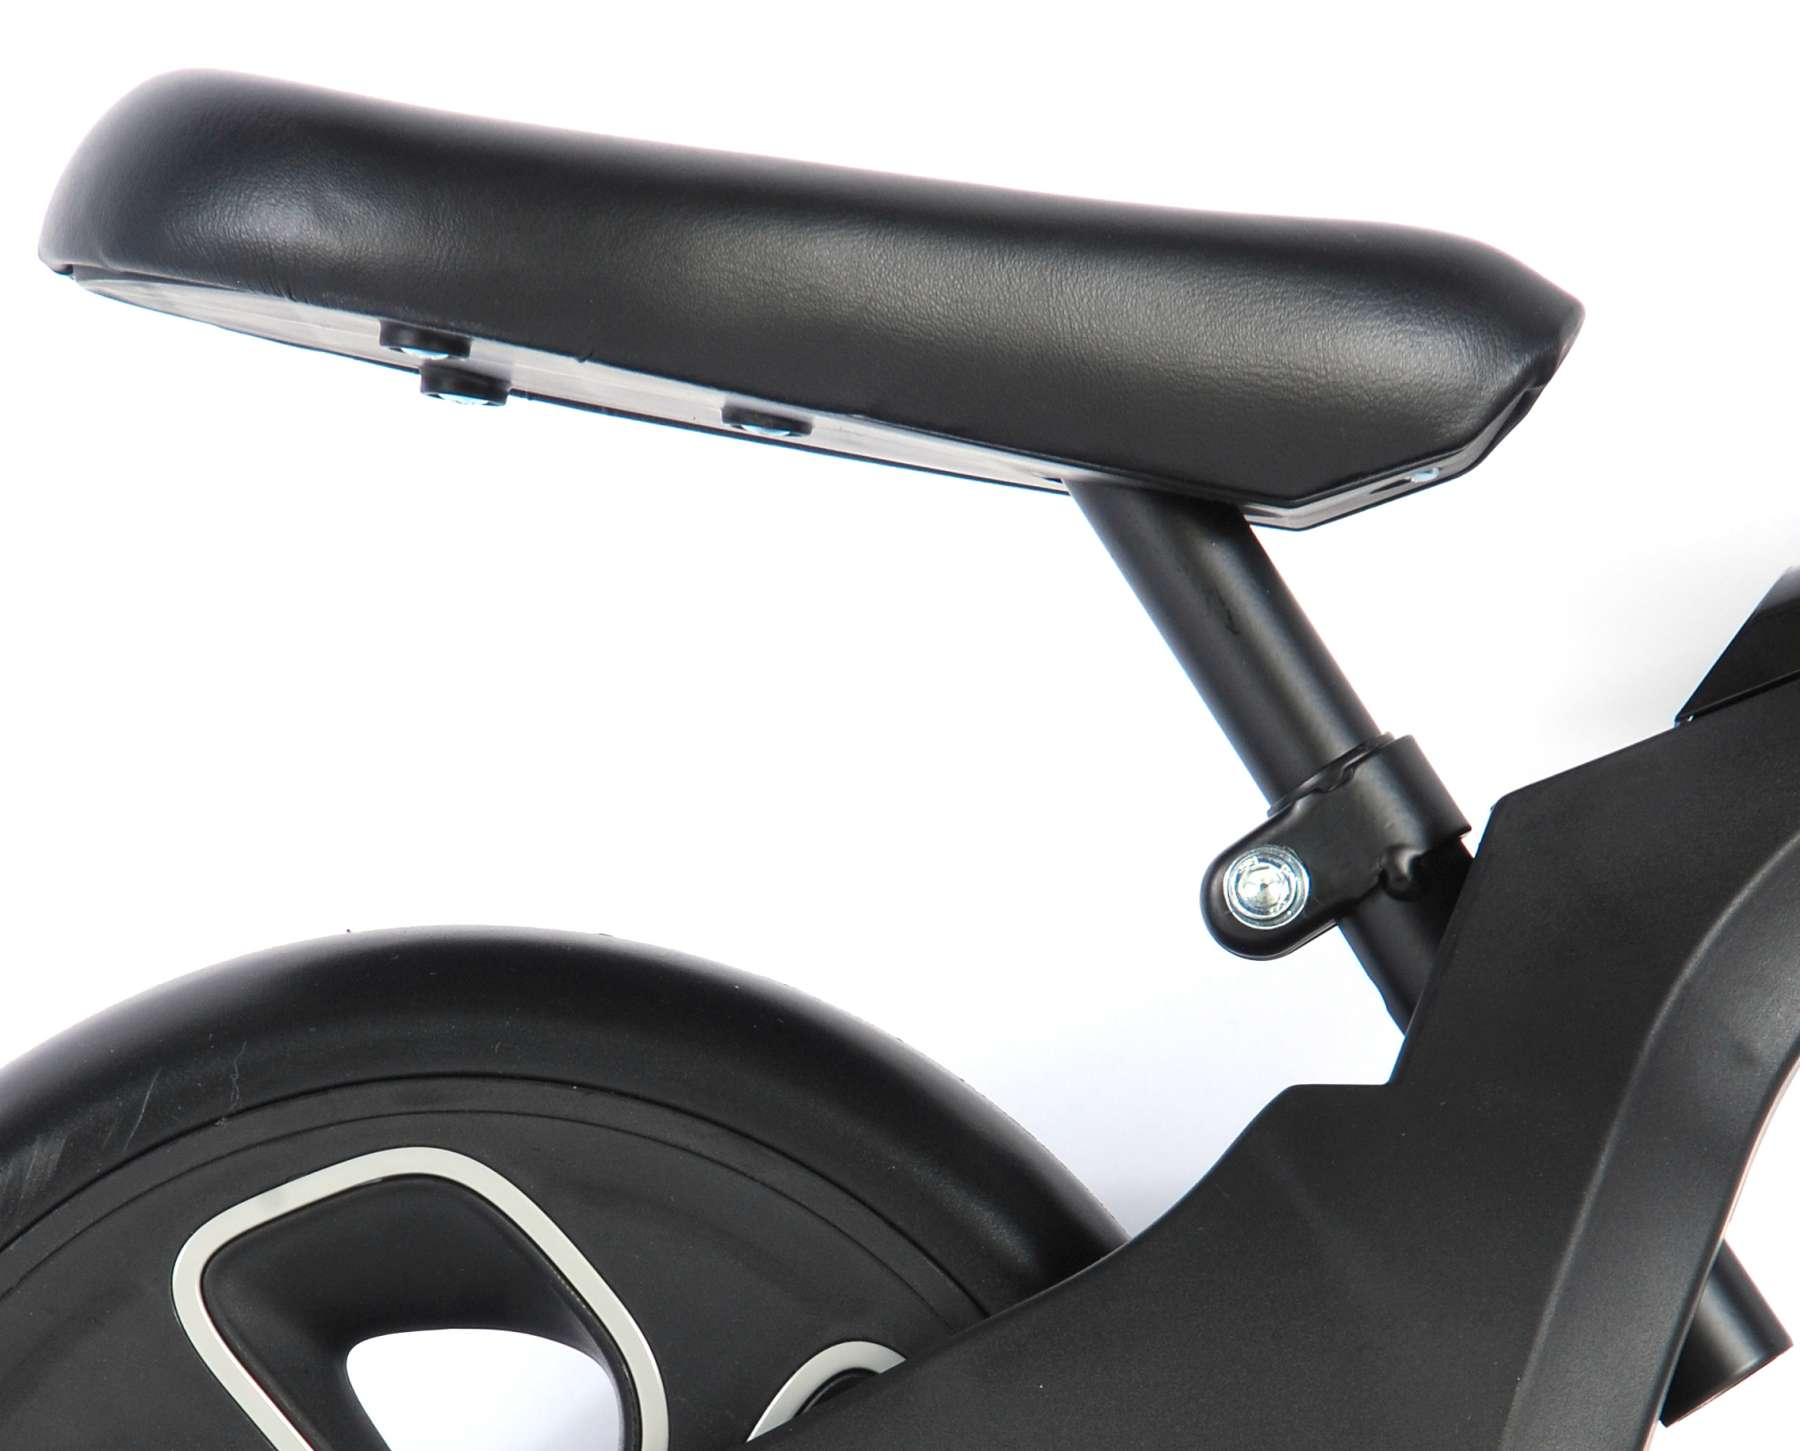 Bicicleta evolutiva QPlay Balance 10 pulgadas Roja - sillín